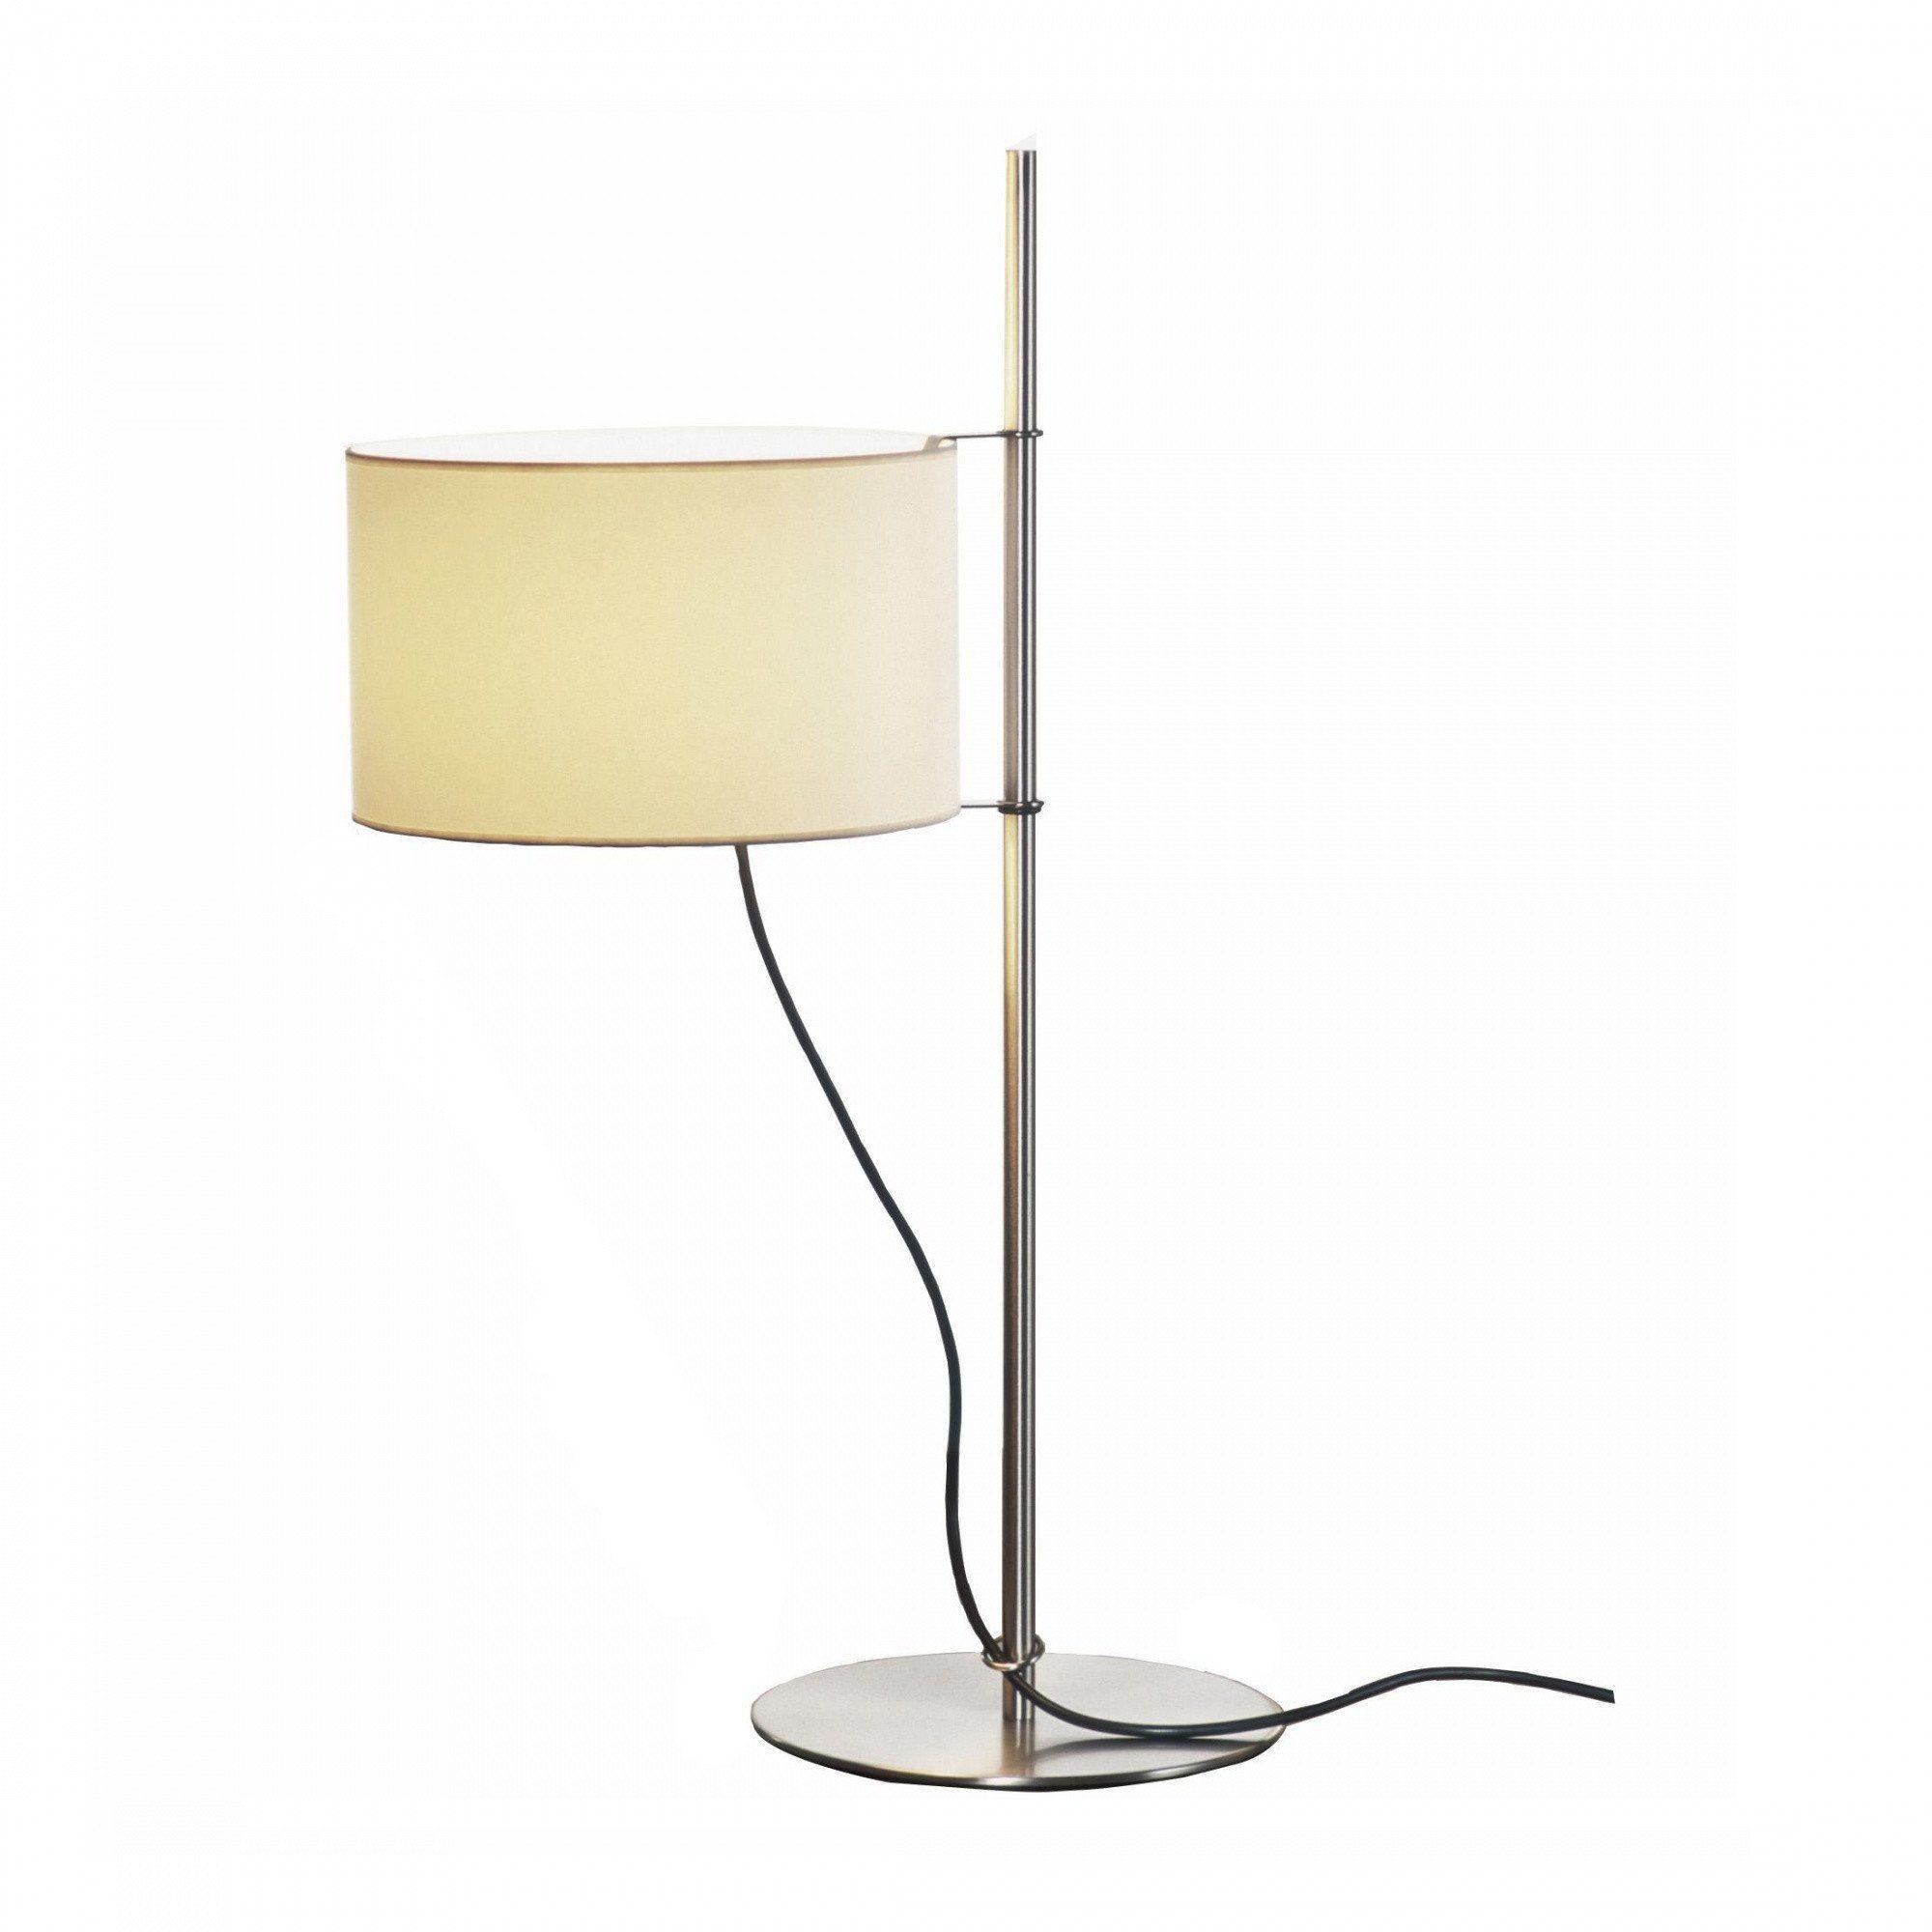 santa cole tmd lampe de table ambientedirect. Black Bedroom Furniture Sets. Home Design Ideas